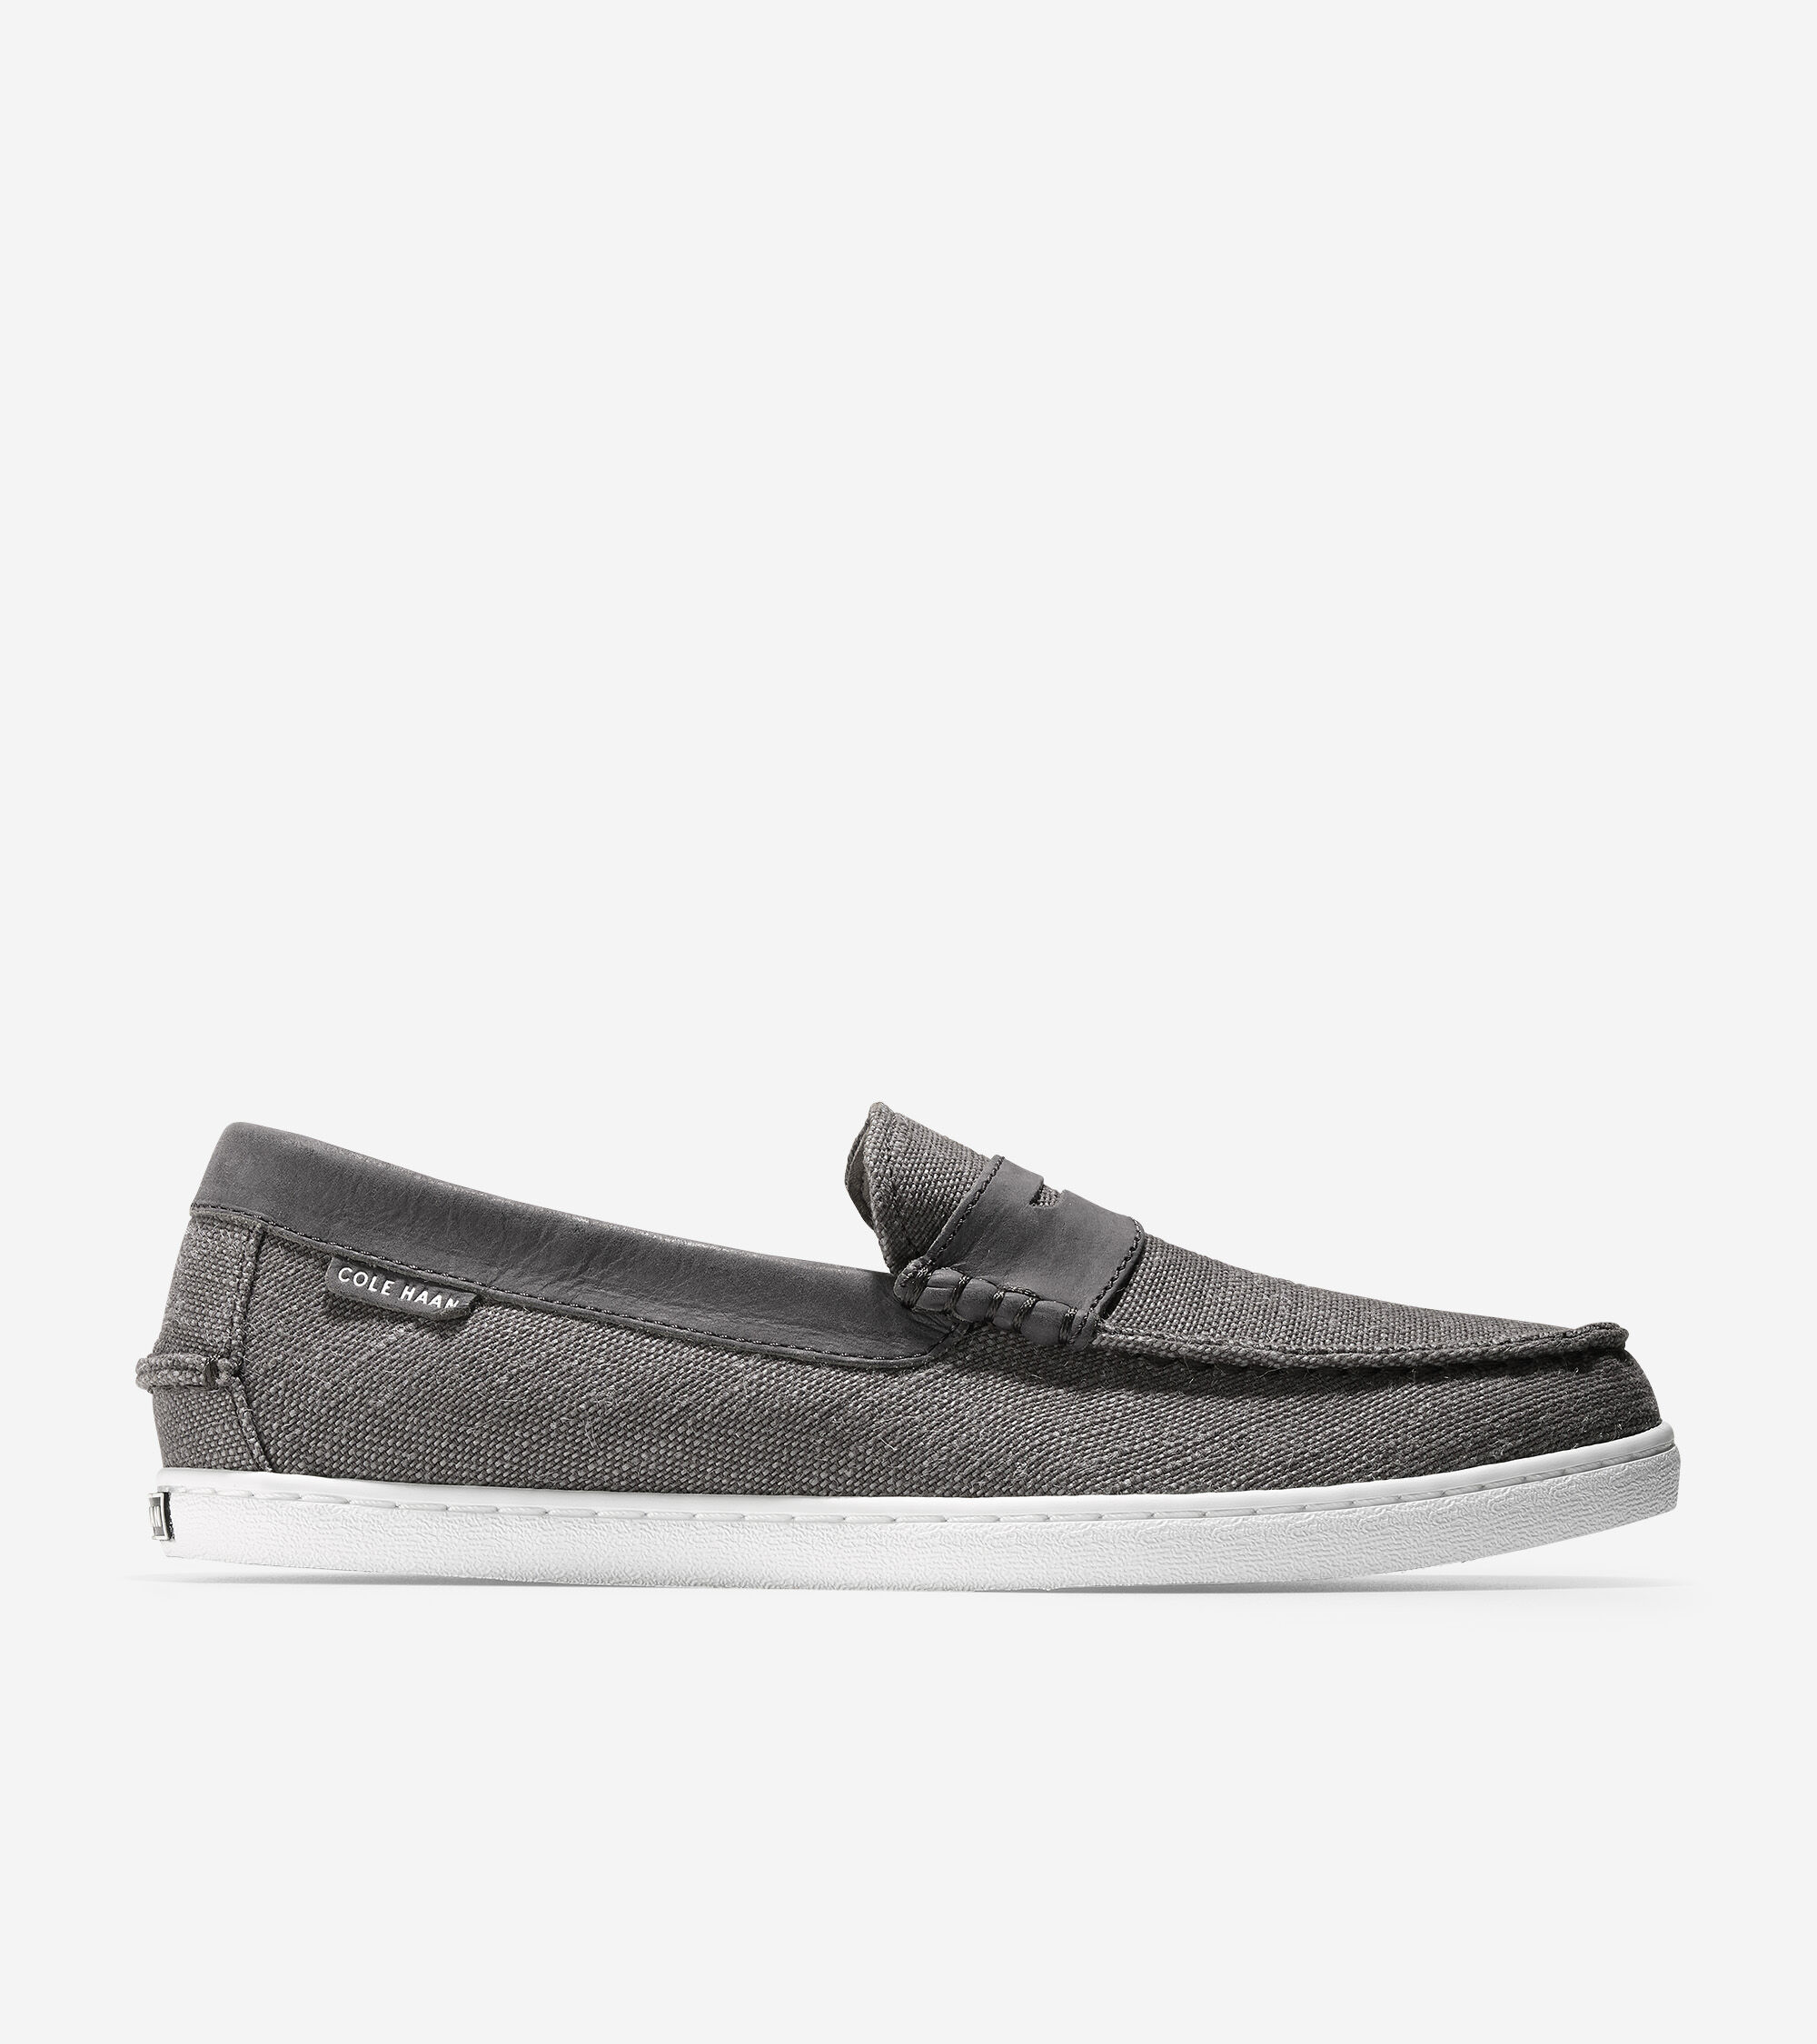 Pinch Weekender Loafer in Grey Canvas